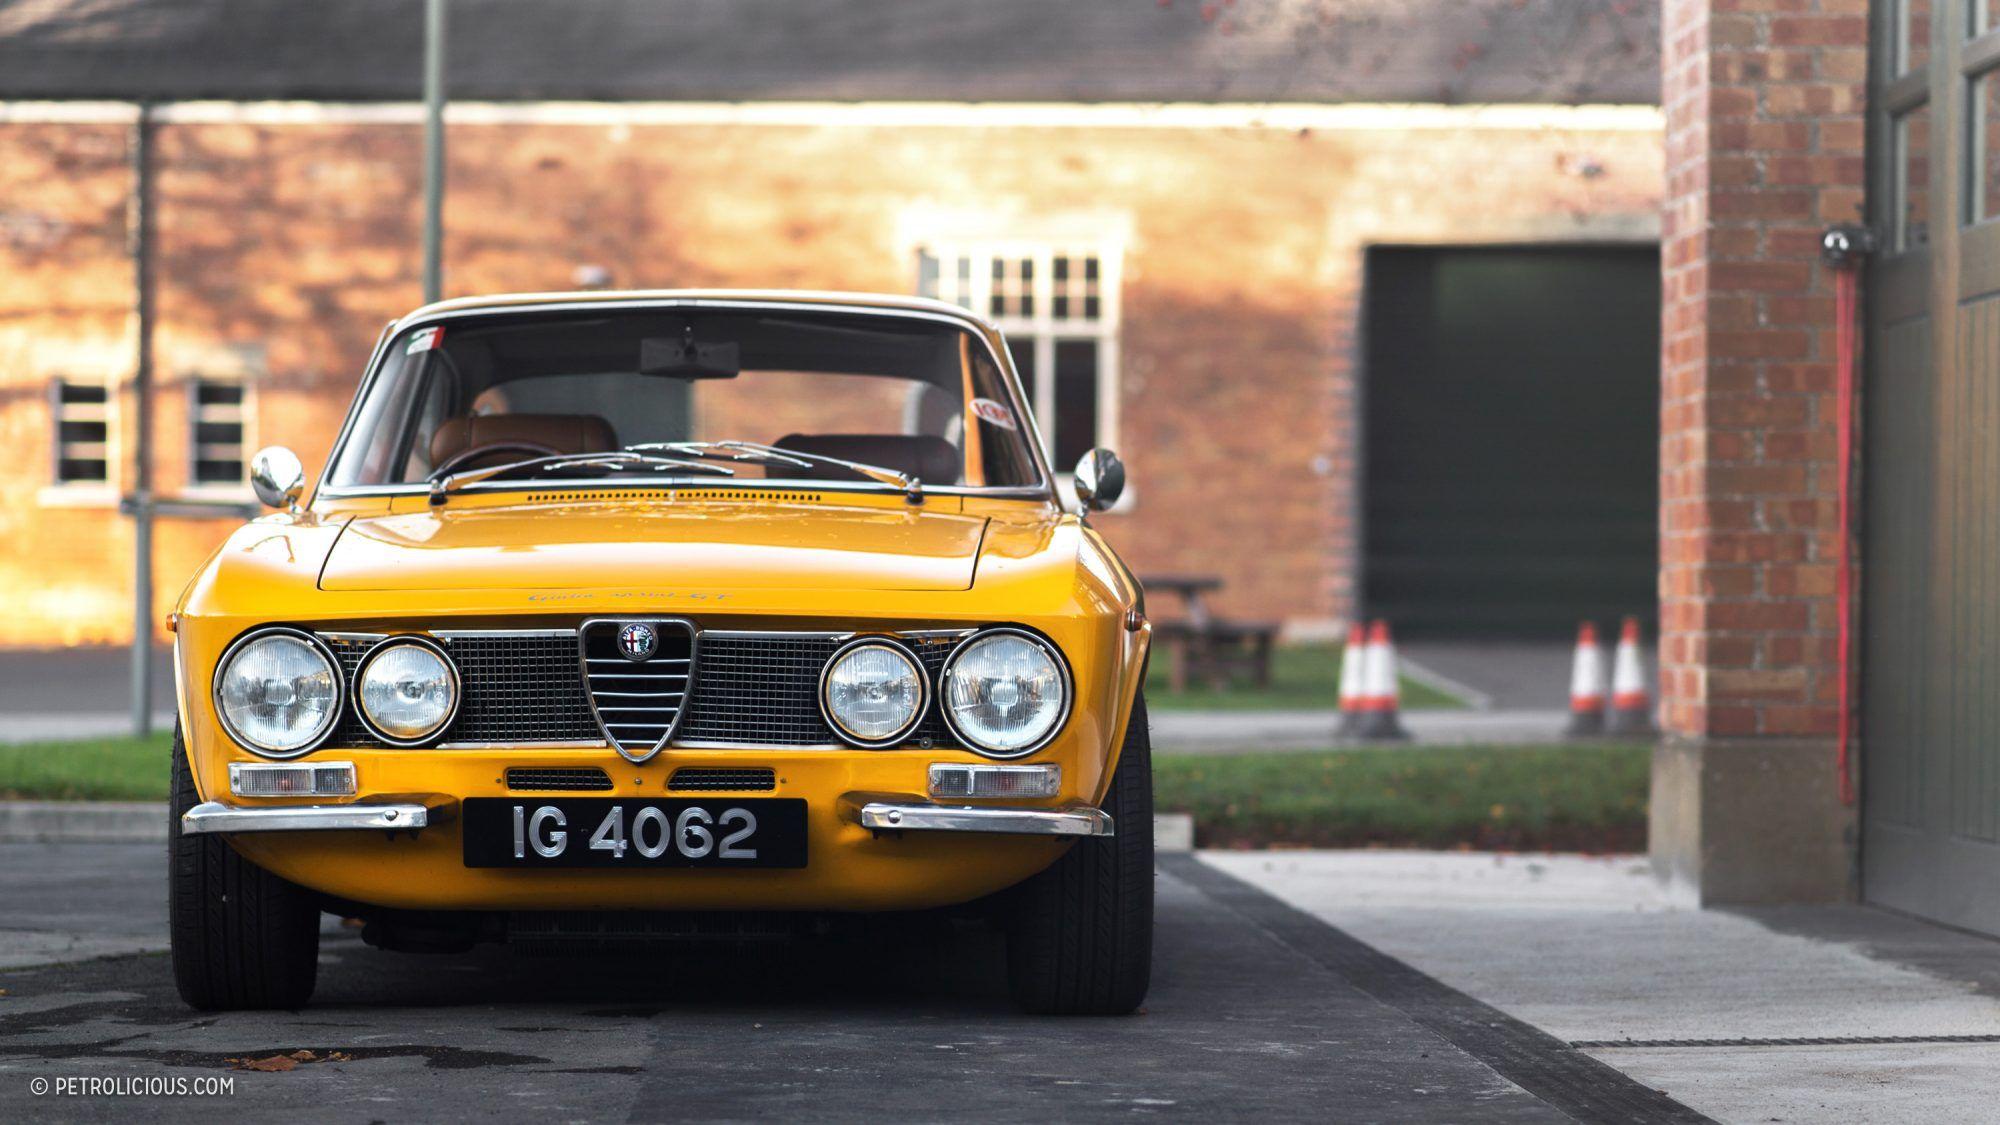 This Alfa Romeo Gtv 1750 Was Love At First Street Parked Sight In 2021 Alfa Romeo Gtv Alfa Romeo Alfa Romeo Cars